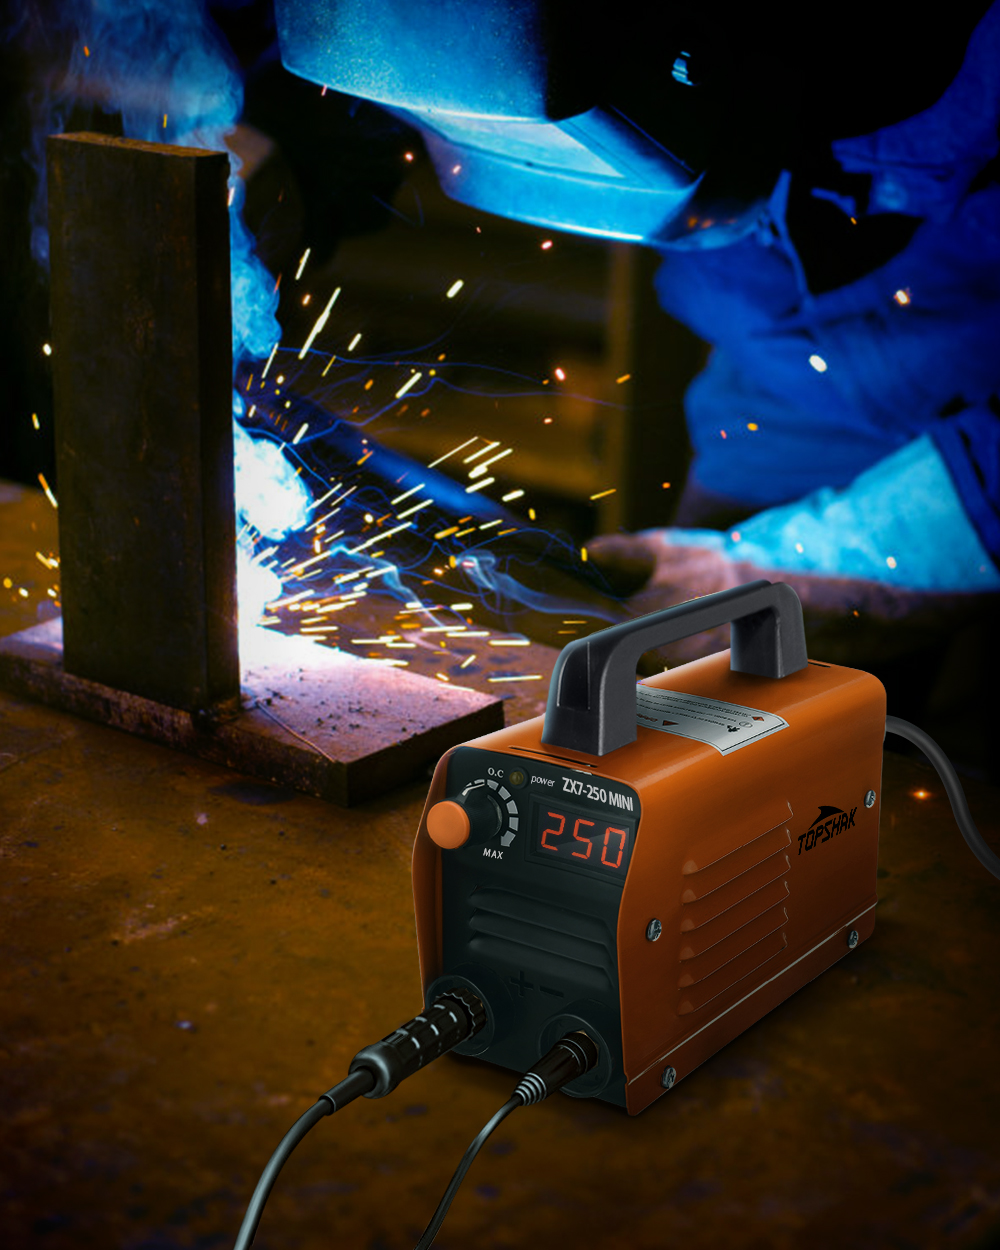 Topshak ZX7-250 250A 220V Mini Electric Welding Machine Portable Digital Display MMA ARC DC Inverter Plastic Welder Weld Equipment